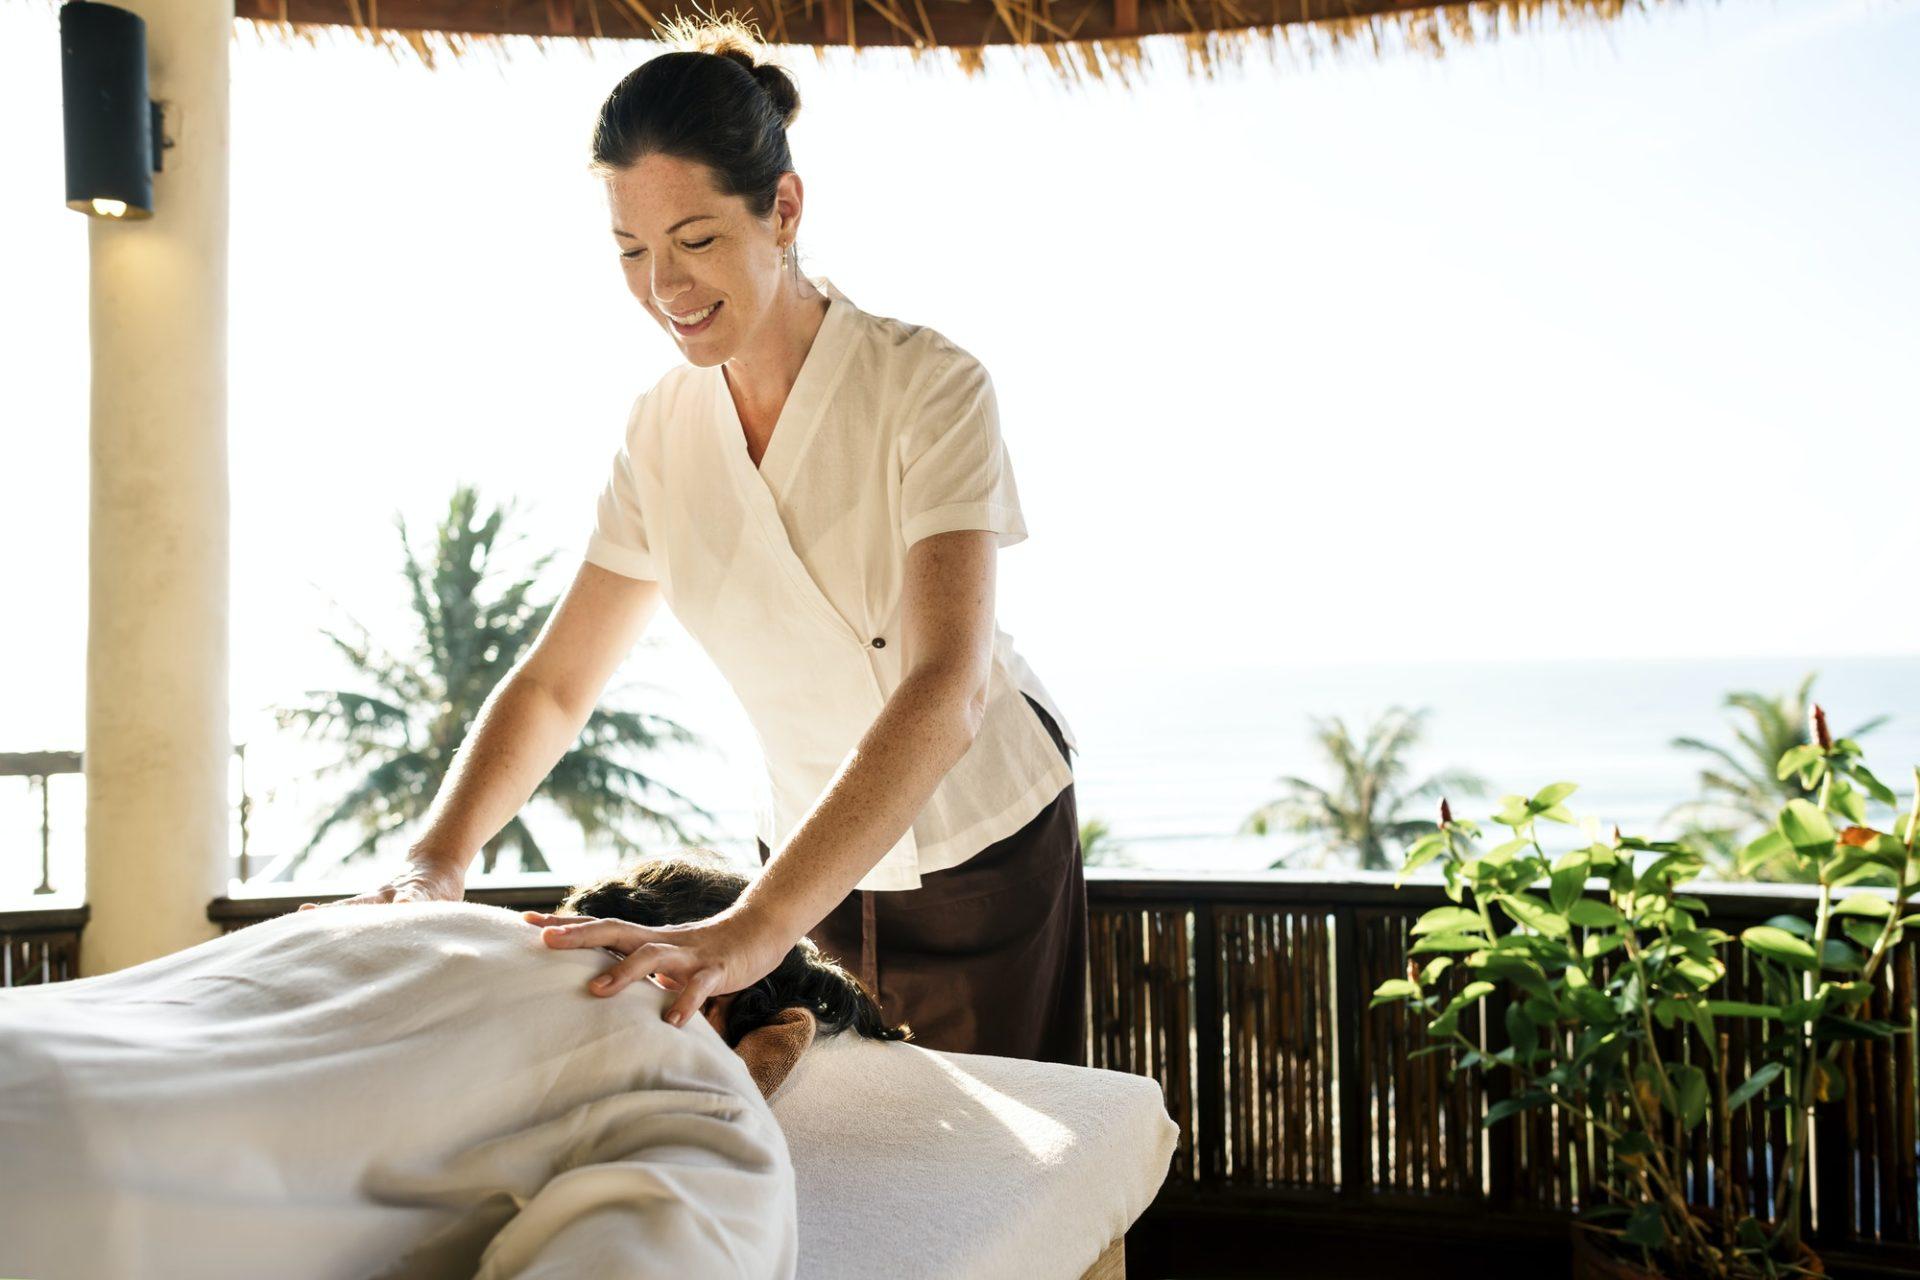 Female massage therapist giving a massage at a spa